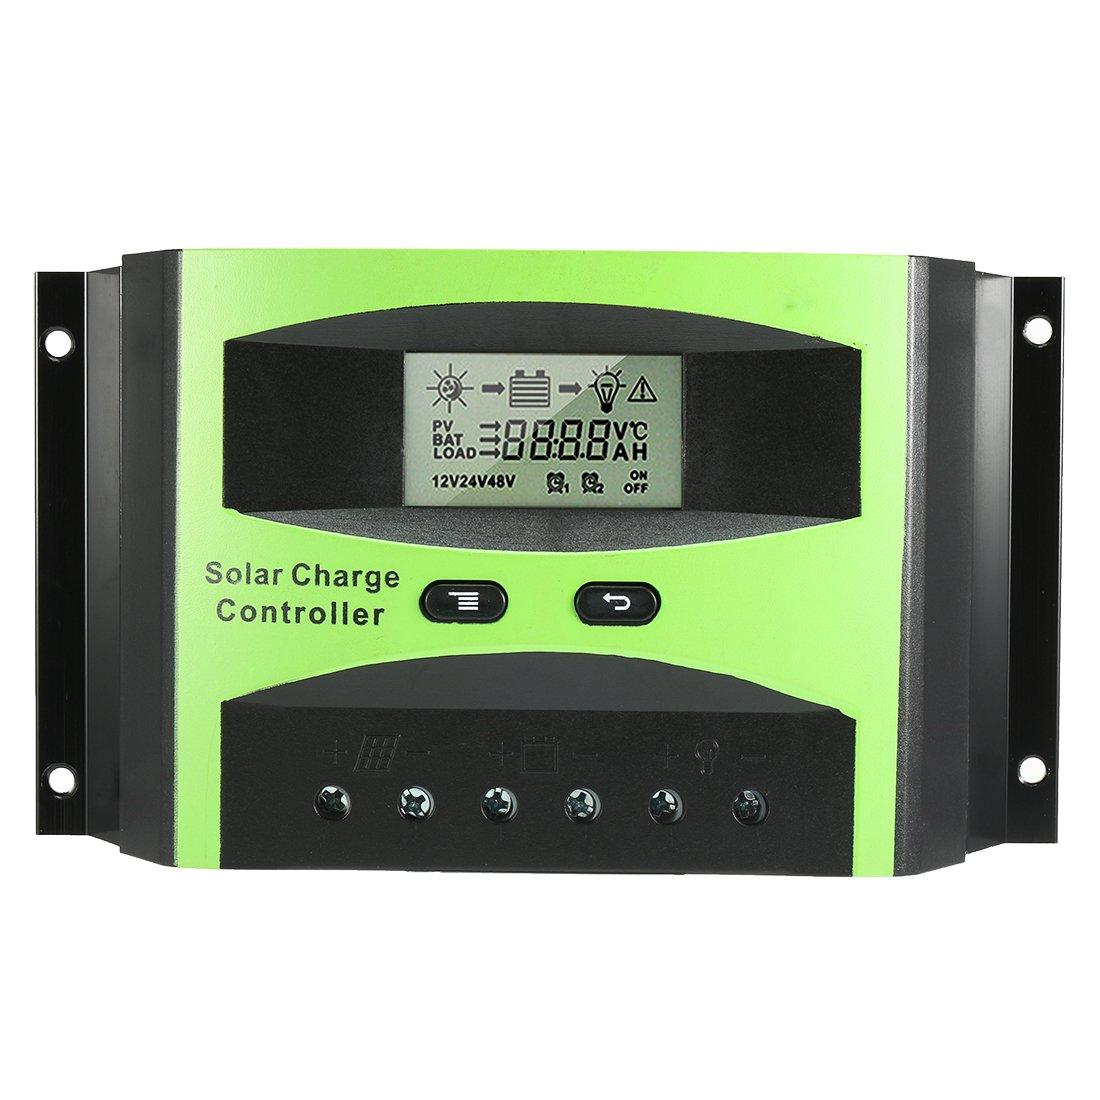 uxcell Intelligent PWM 40A Solar Panel Charge Controller 12V-24V Battery Regulator PV2440